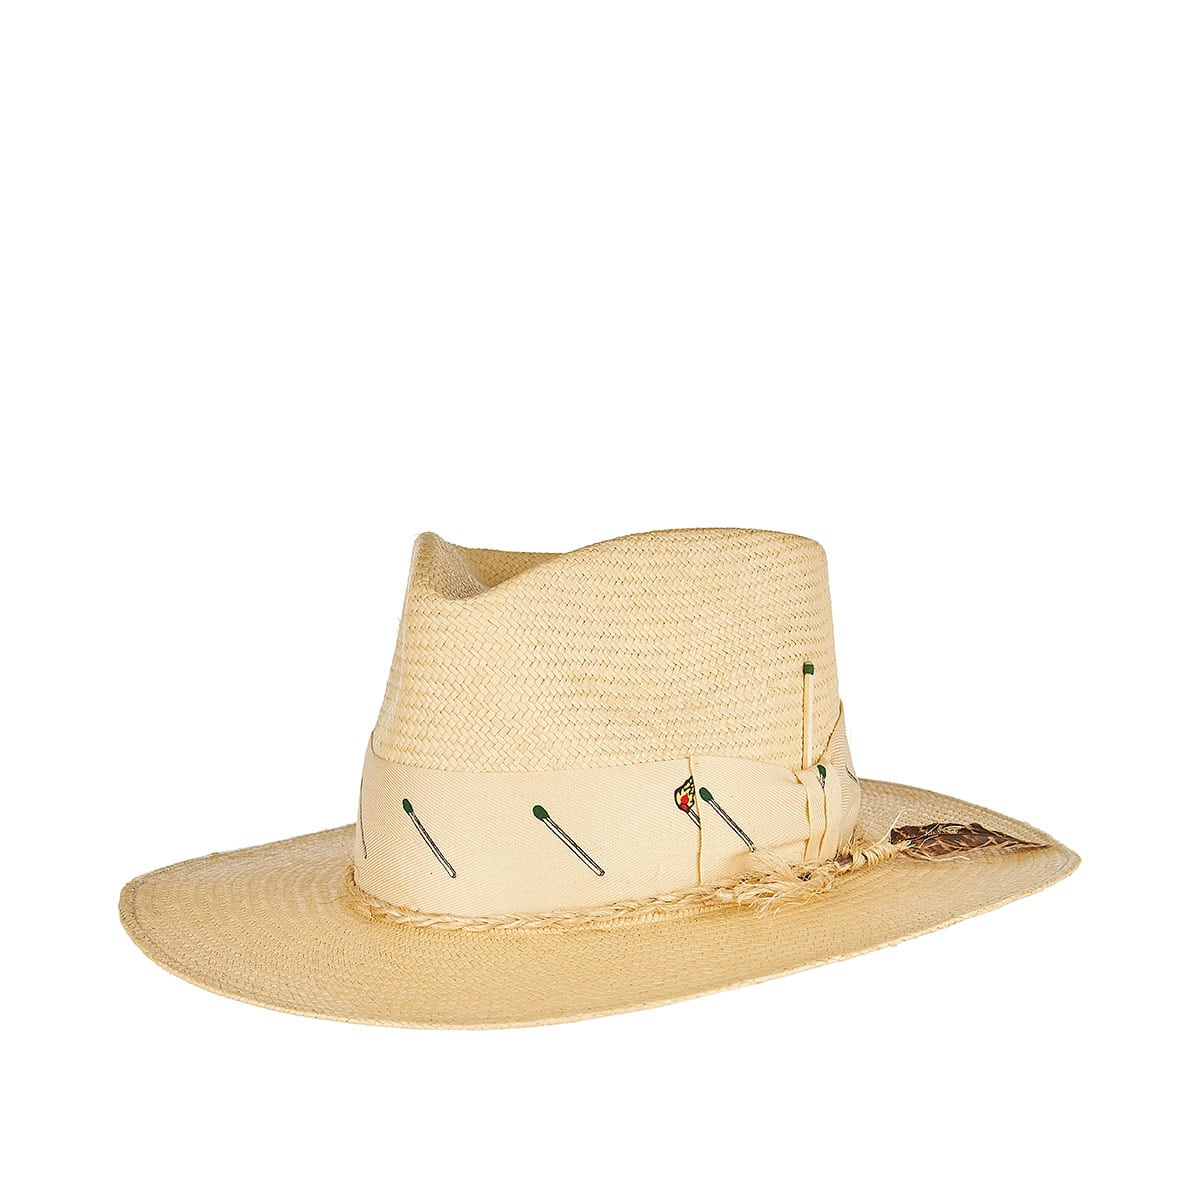 Pontillac straw fedora hat